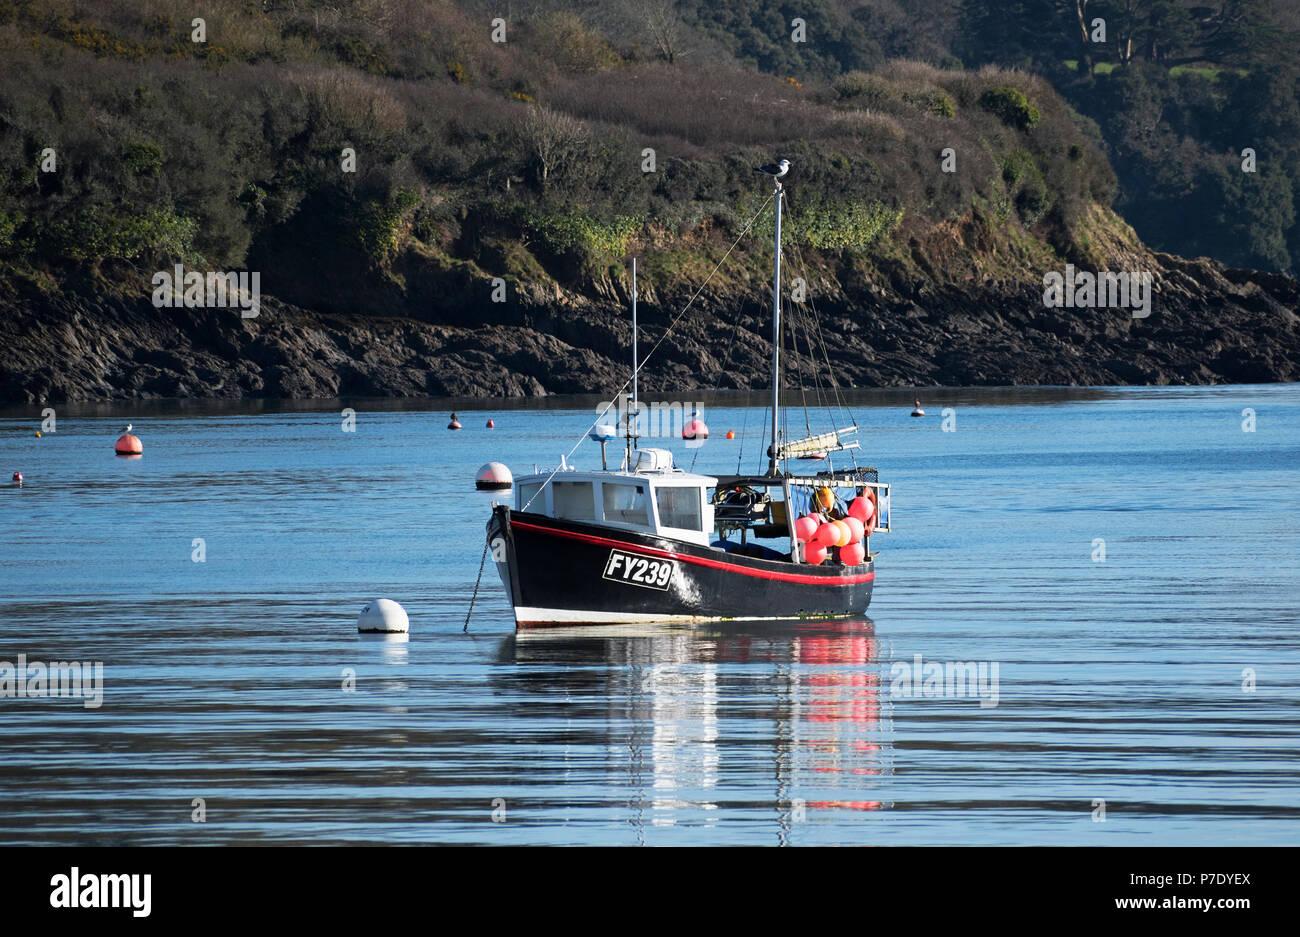 Bateau de pêche sur la rivière helford à Cornwall, Angleterre, Grande-Bretagne, Royaume-Uni. Photo Stock